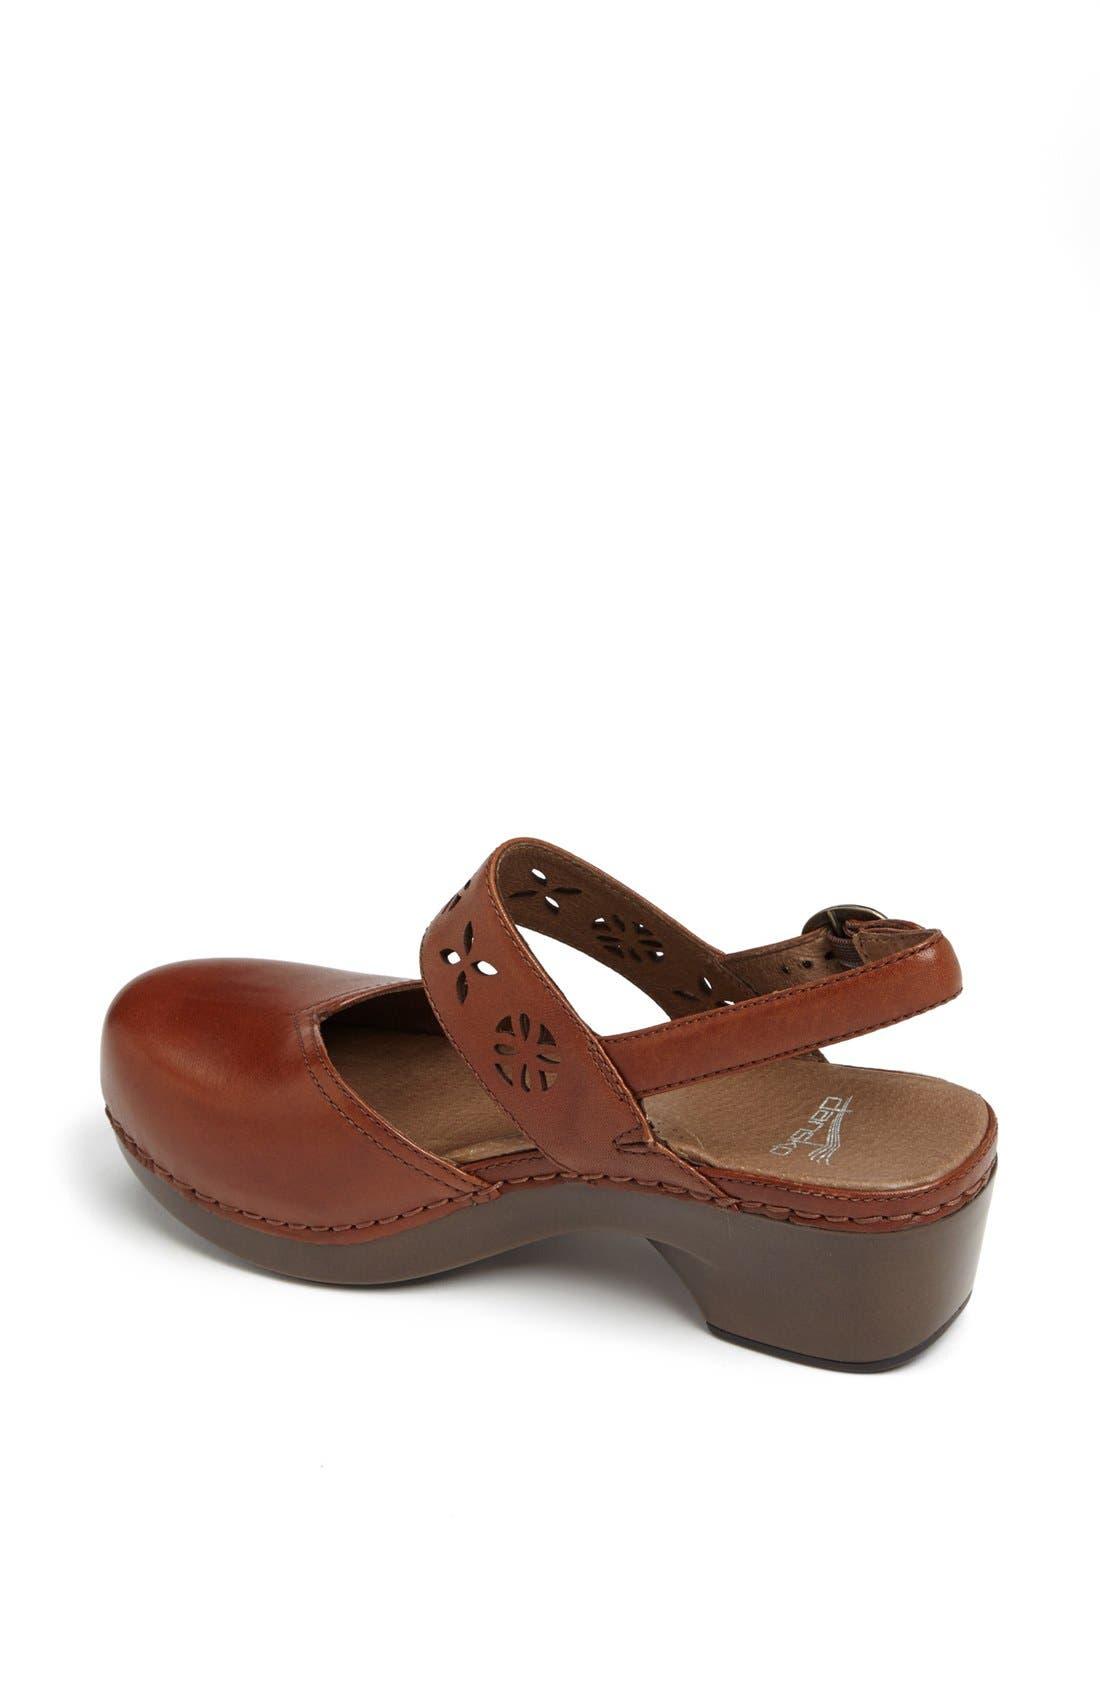 Alternate Image 2  - Dansko 'Trista' Leather Clog